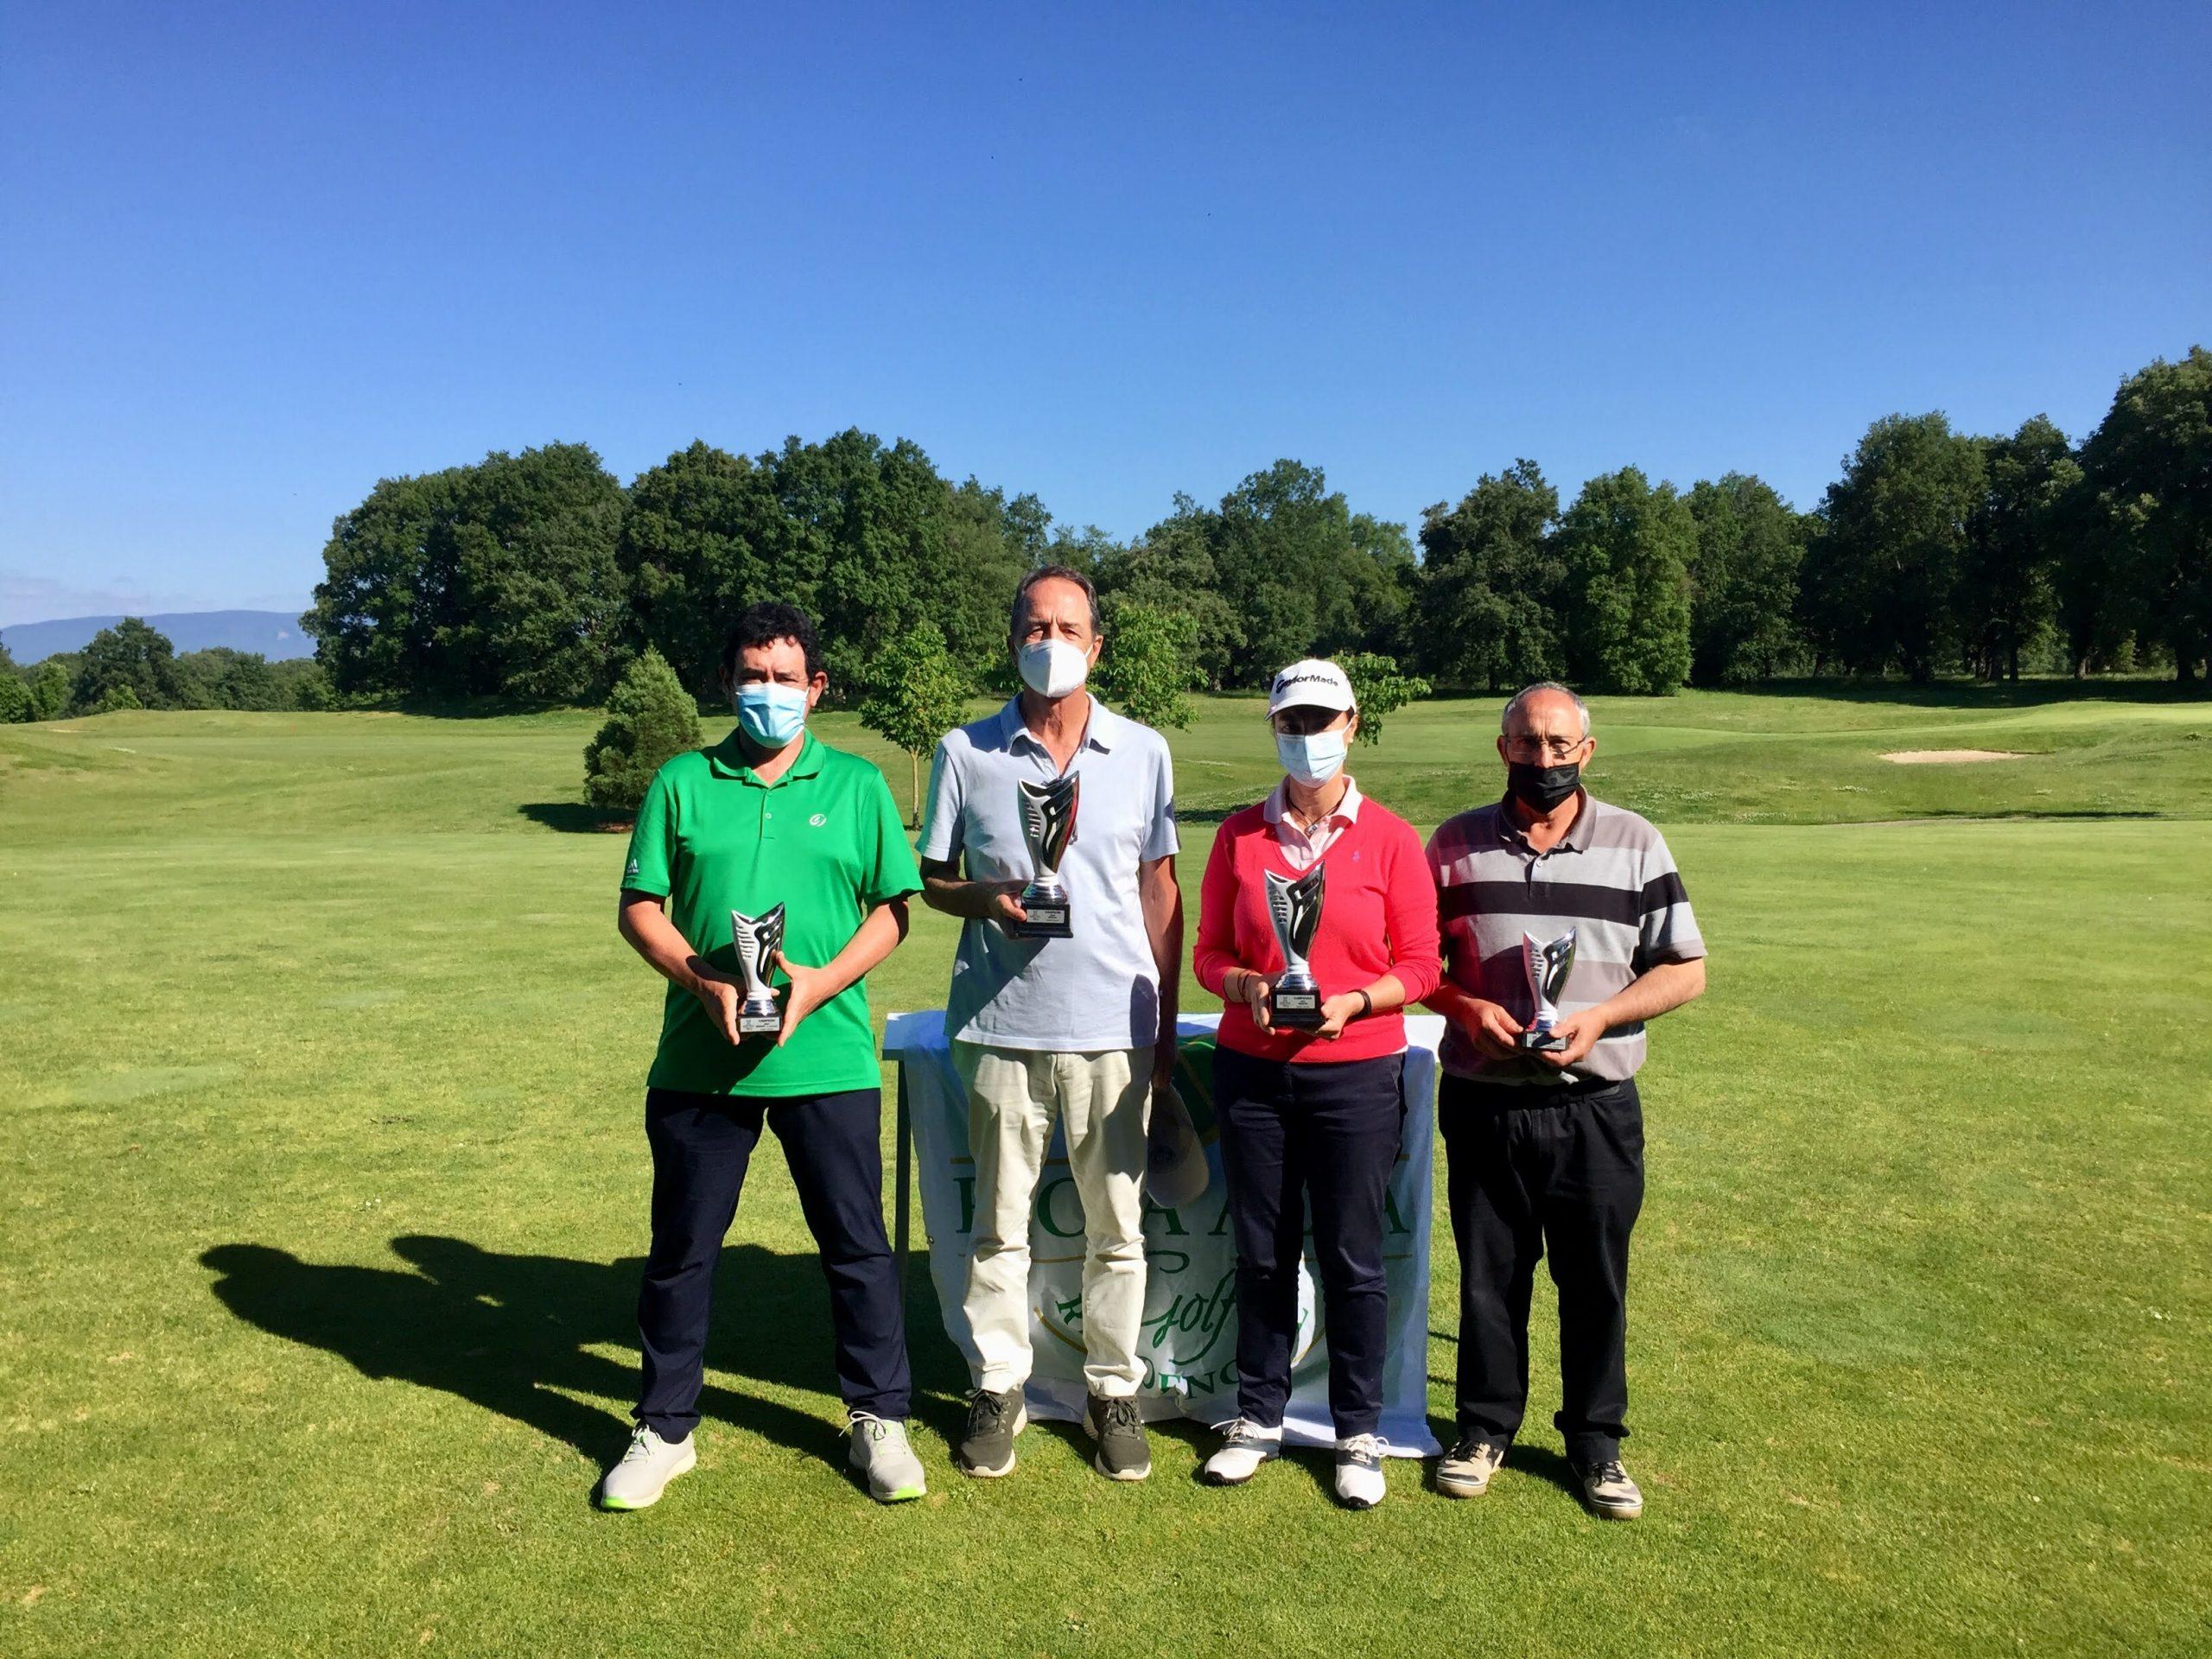 Cto. Rioja Alta Golf Club Senior 2021